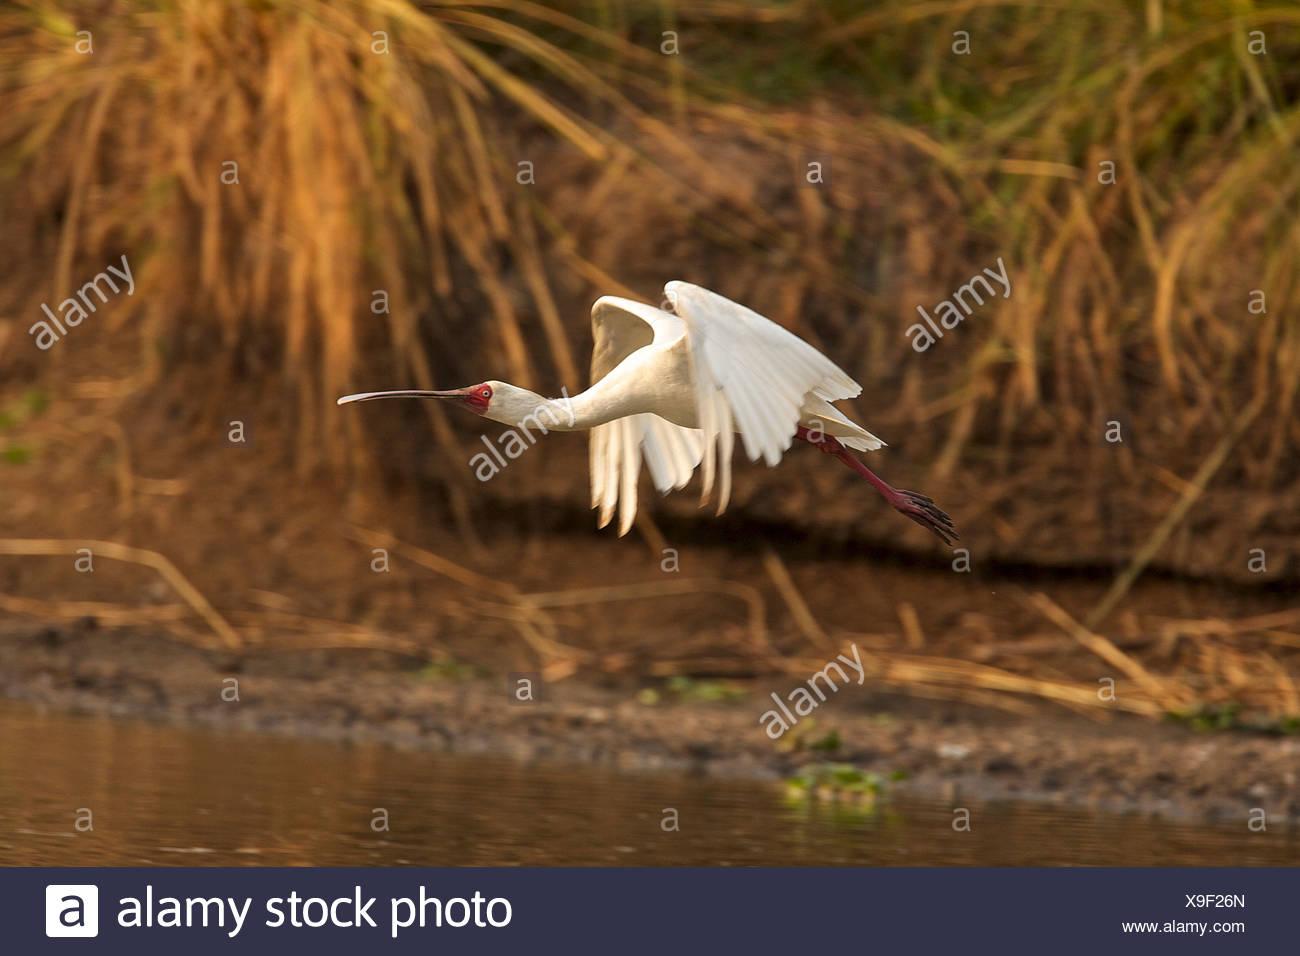 African spoonbill - Platalea alba, Mana Pools National Park, Zimbabwe - Stock Image